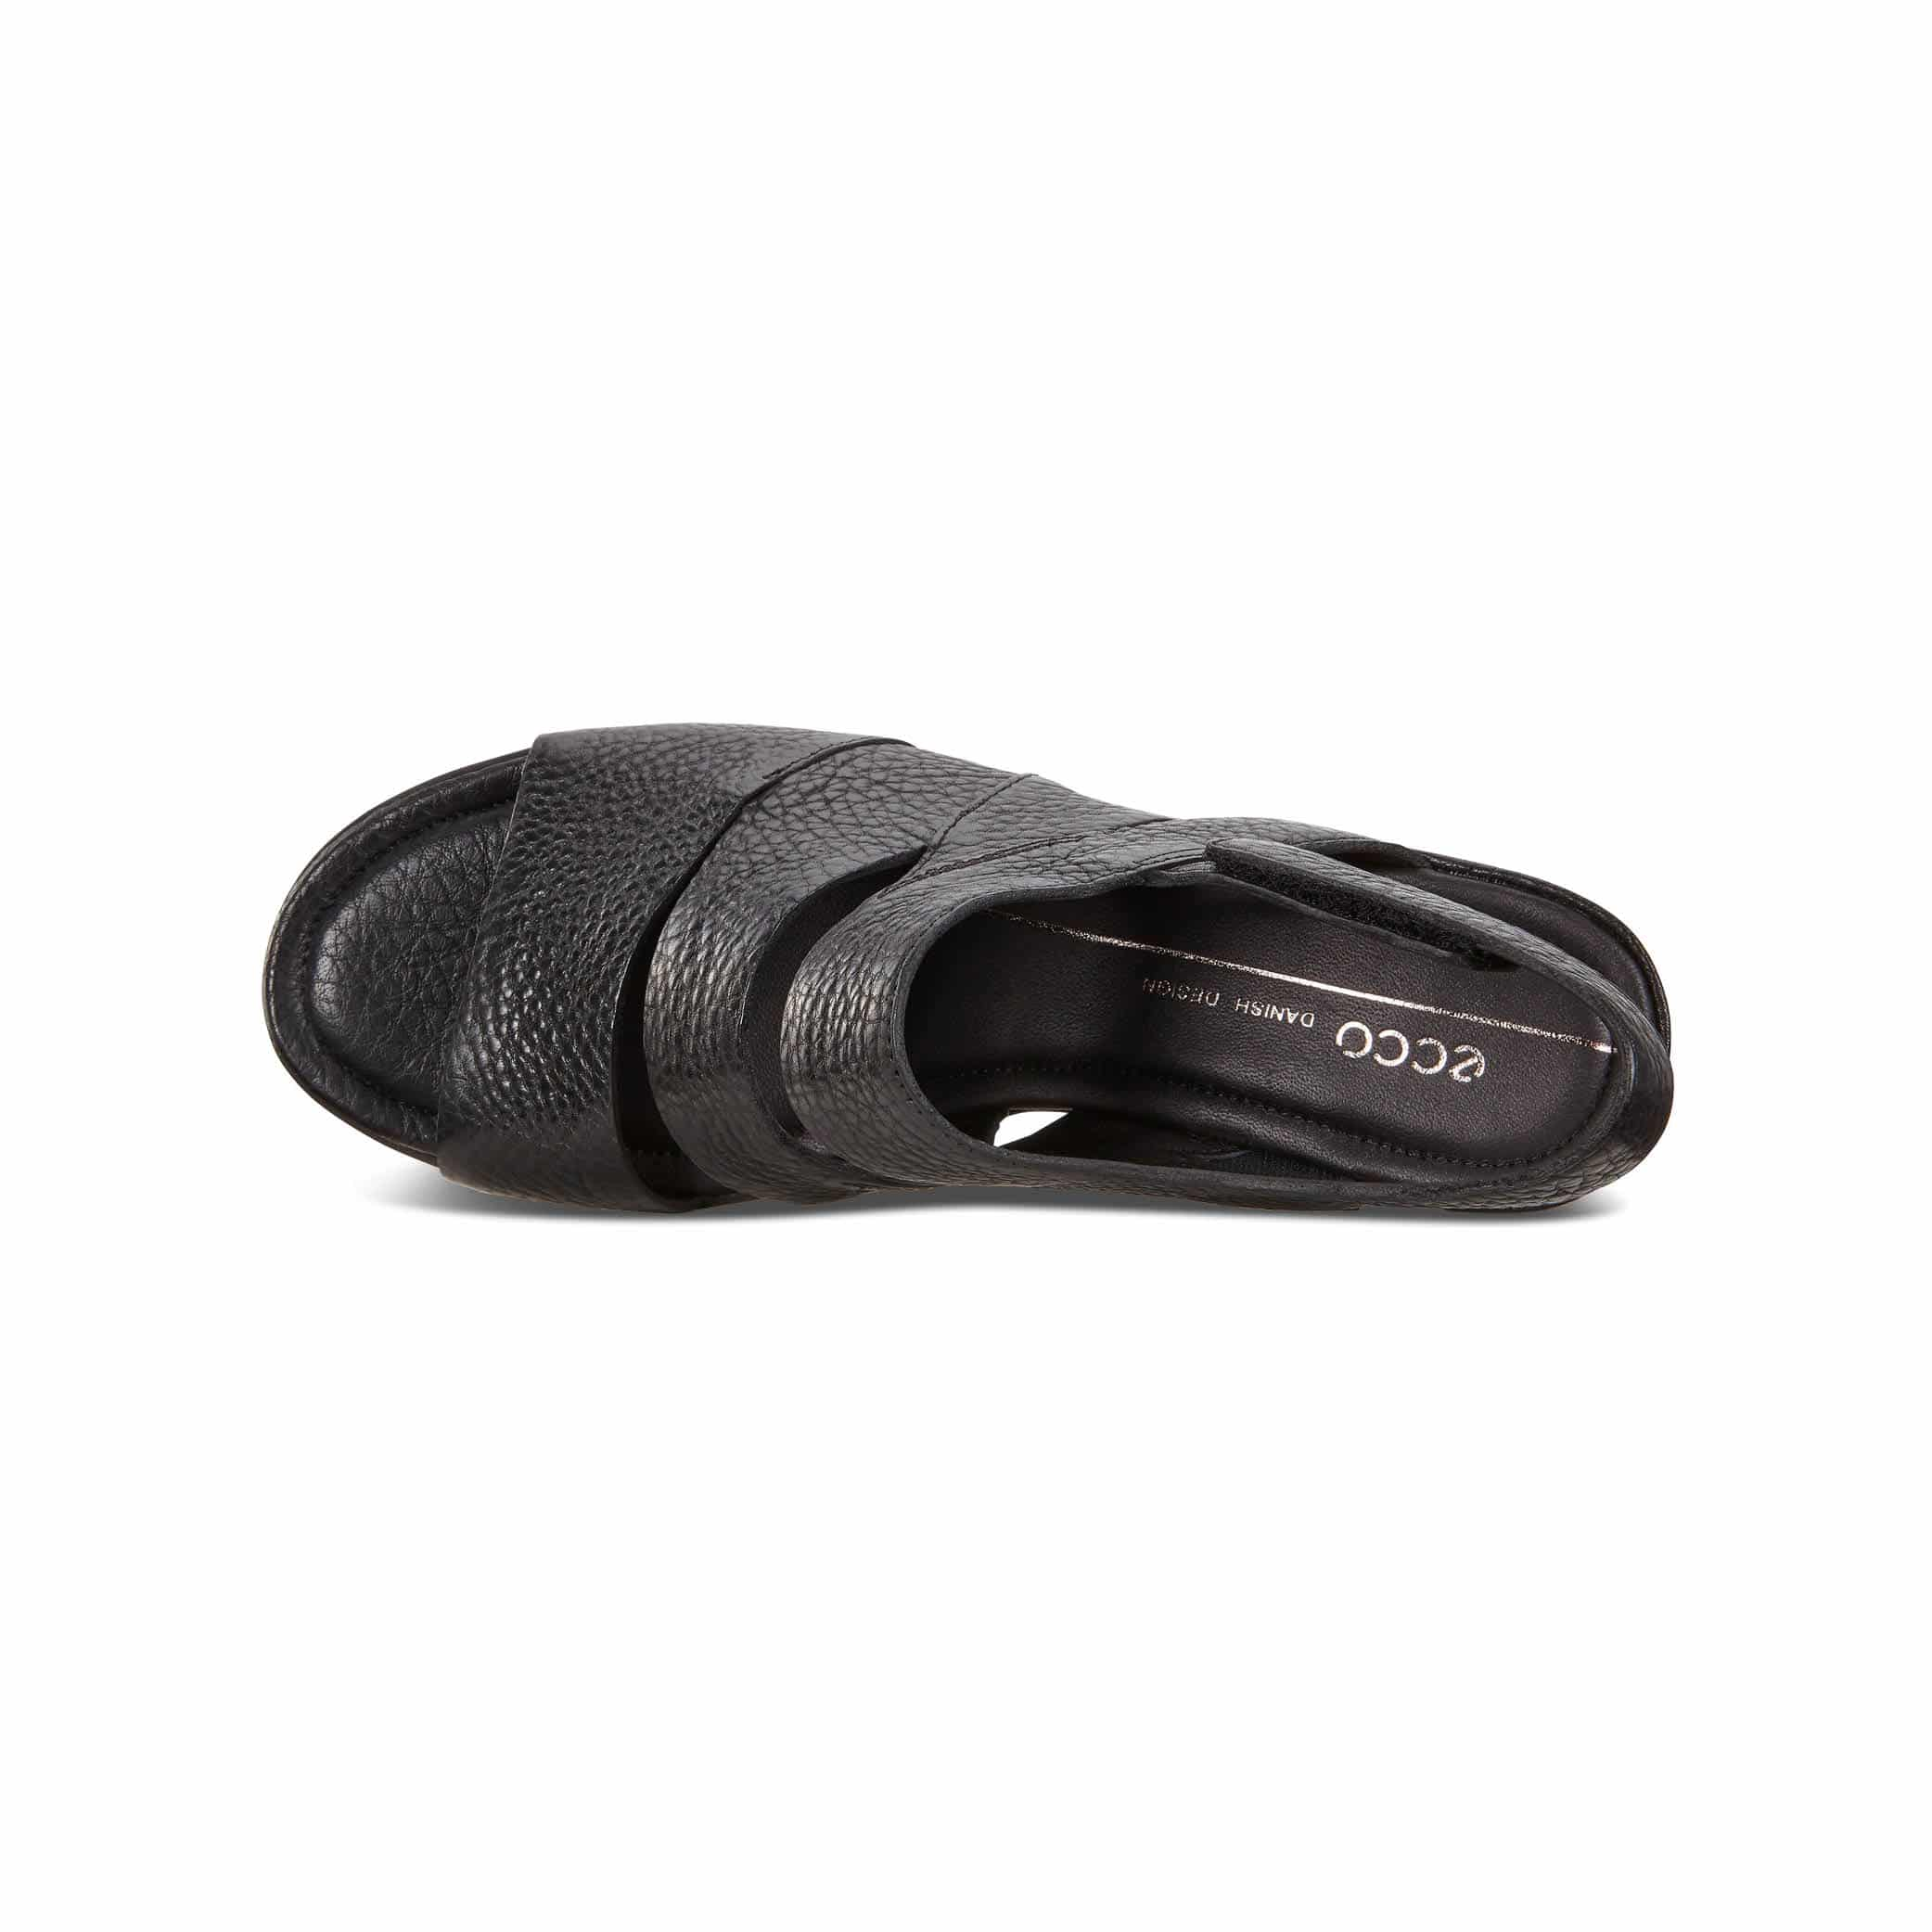 944d3ac1 ECCO SHAPE 35 - ECCO Shoes for Men, Women & Kids